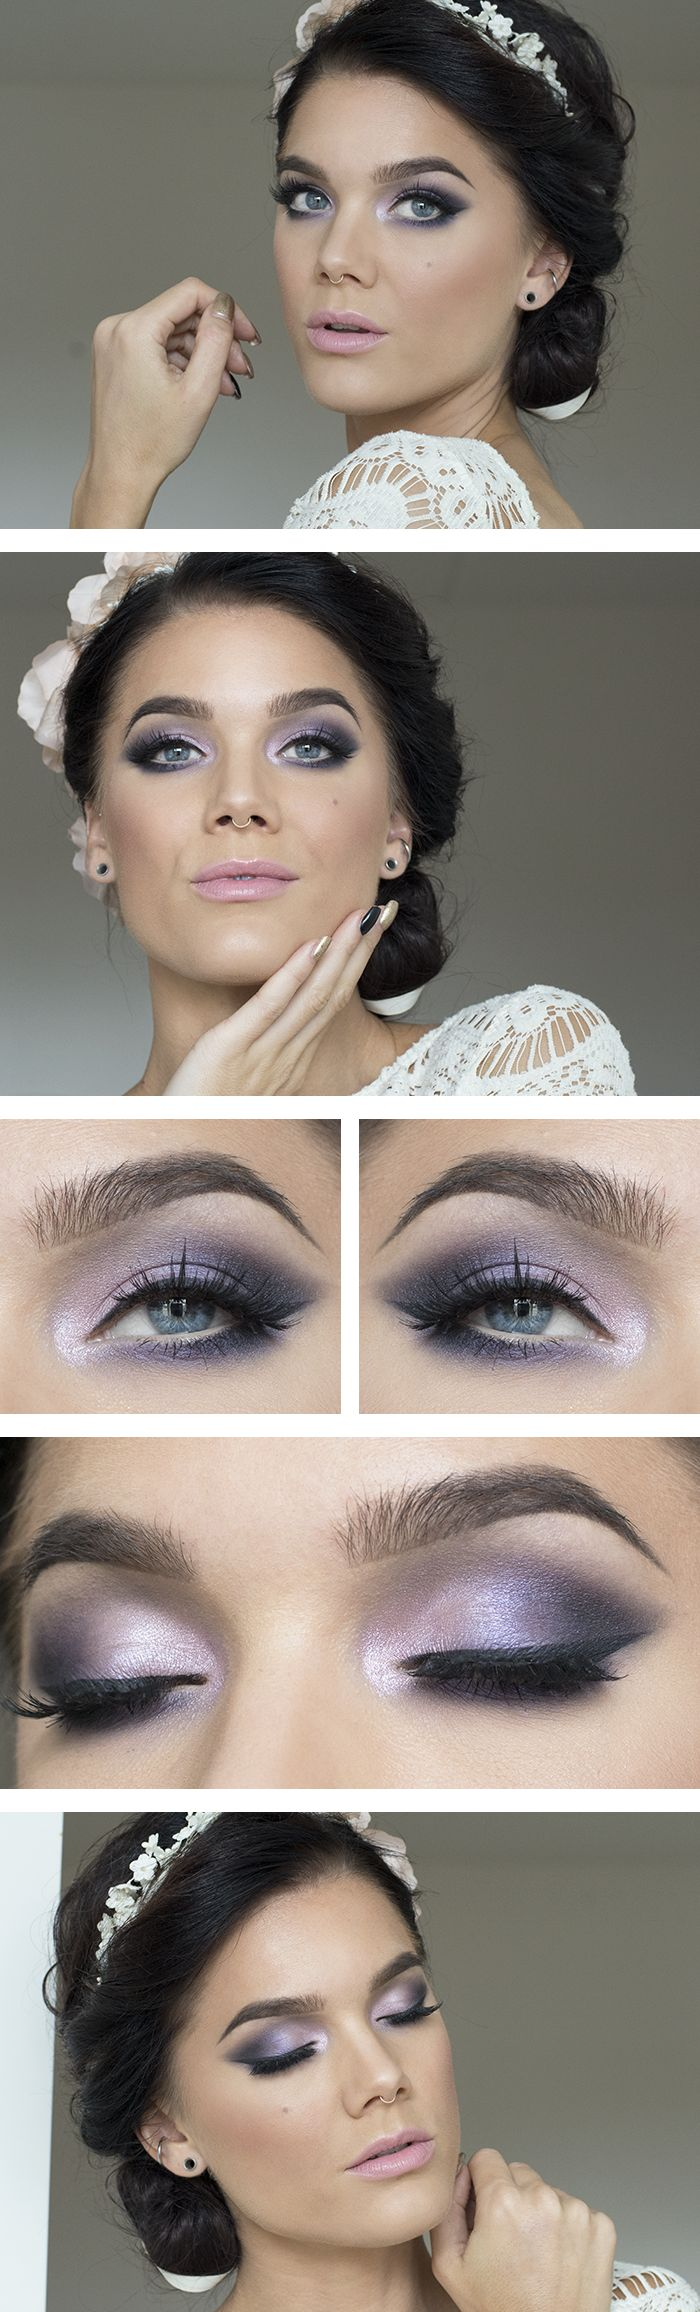 White dress eye makeup - Todays Look Bridal Purple Linda Sminkblogg